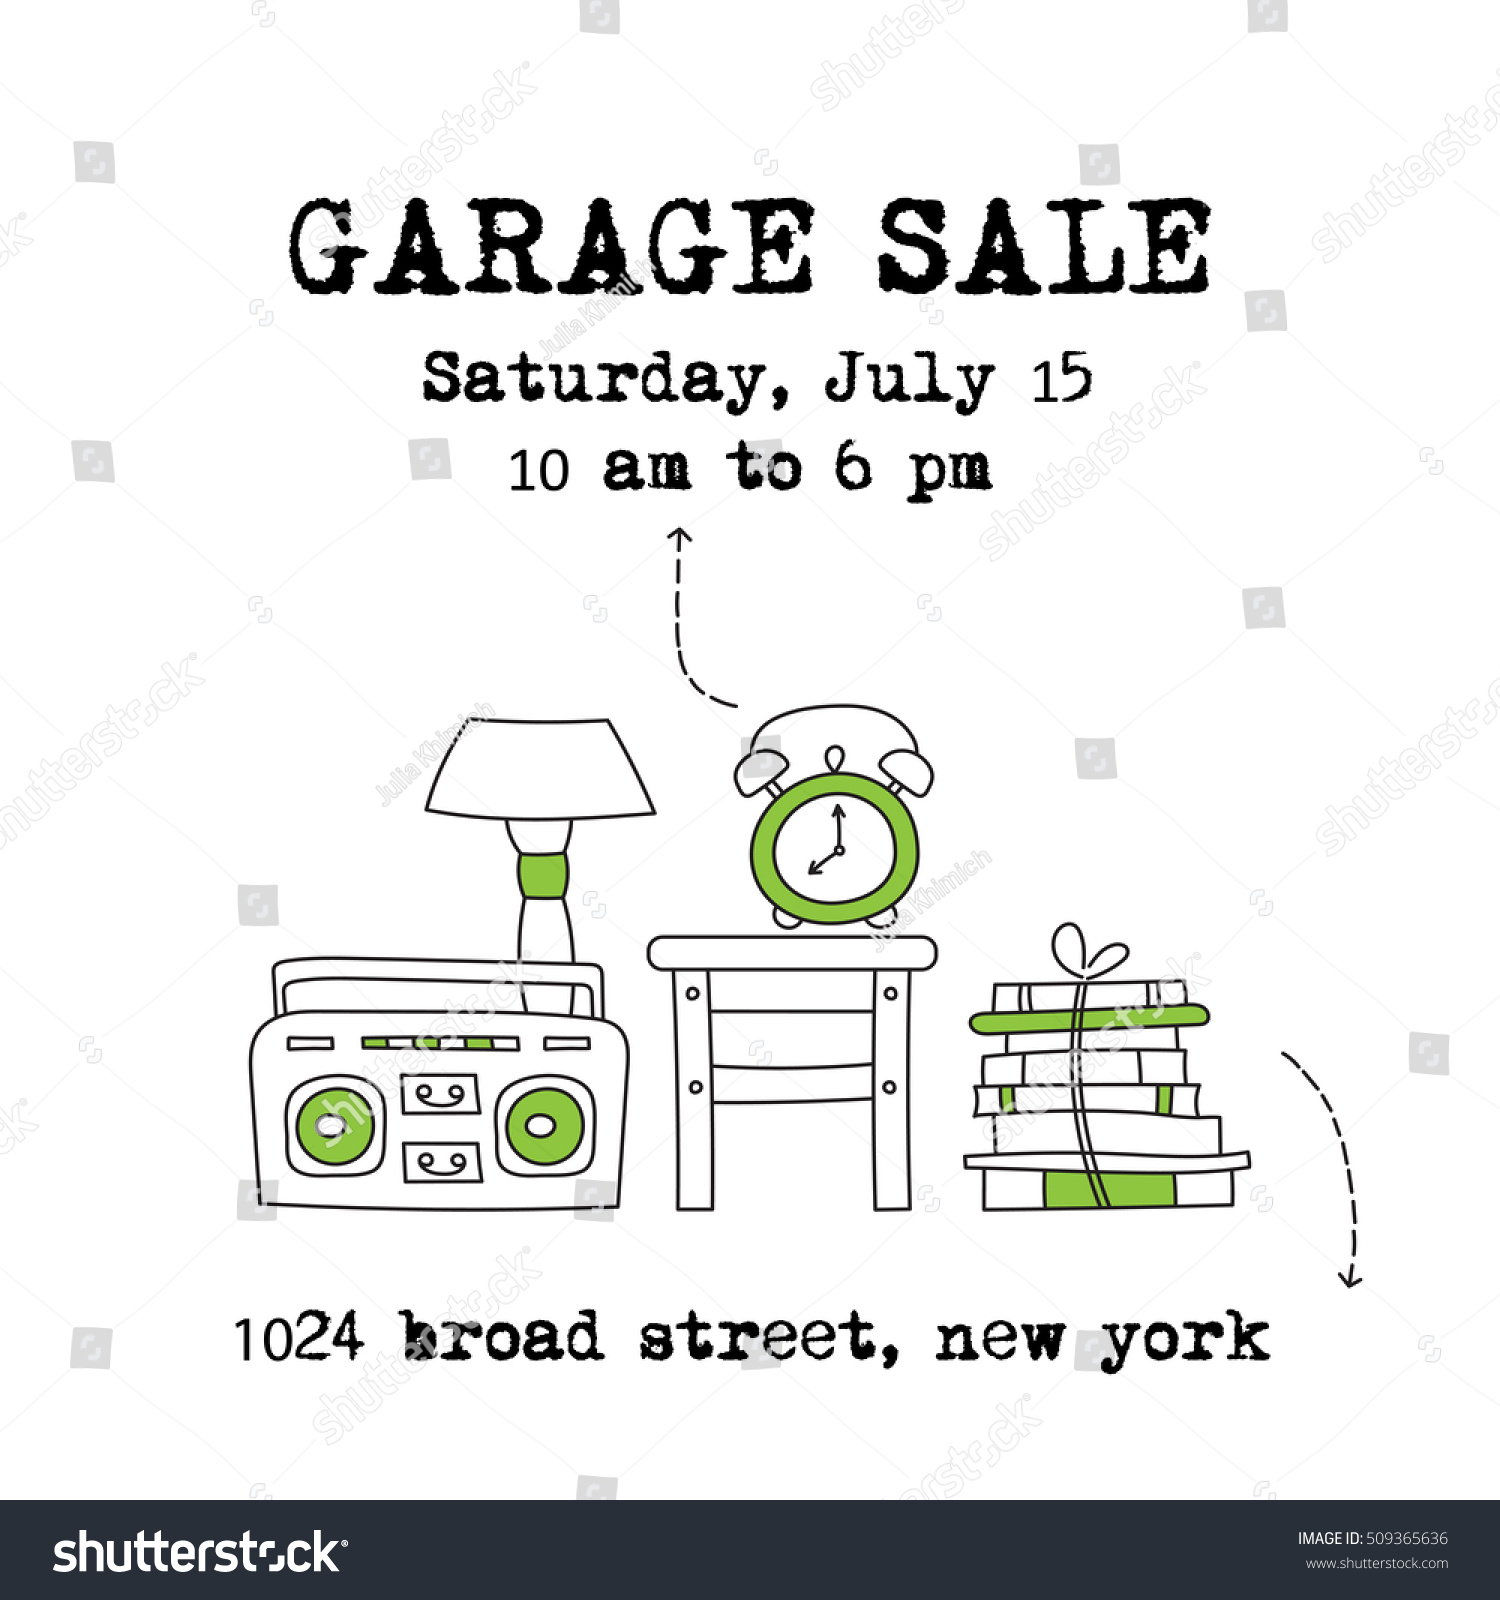 Garage Sale Household Used Goods Vector Stock-Vektorgrafik 509365636 ...